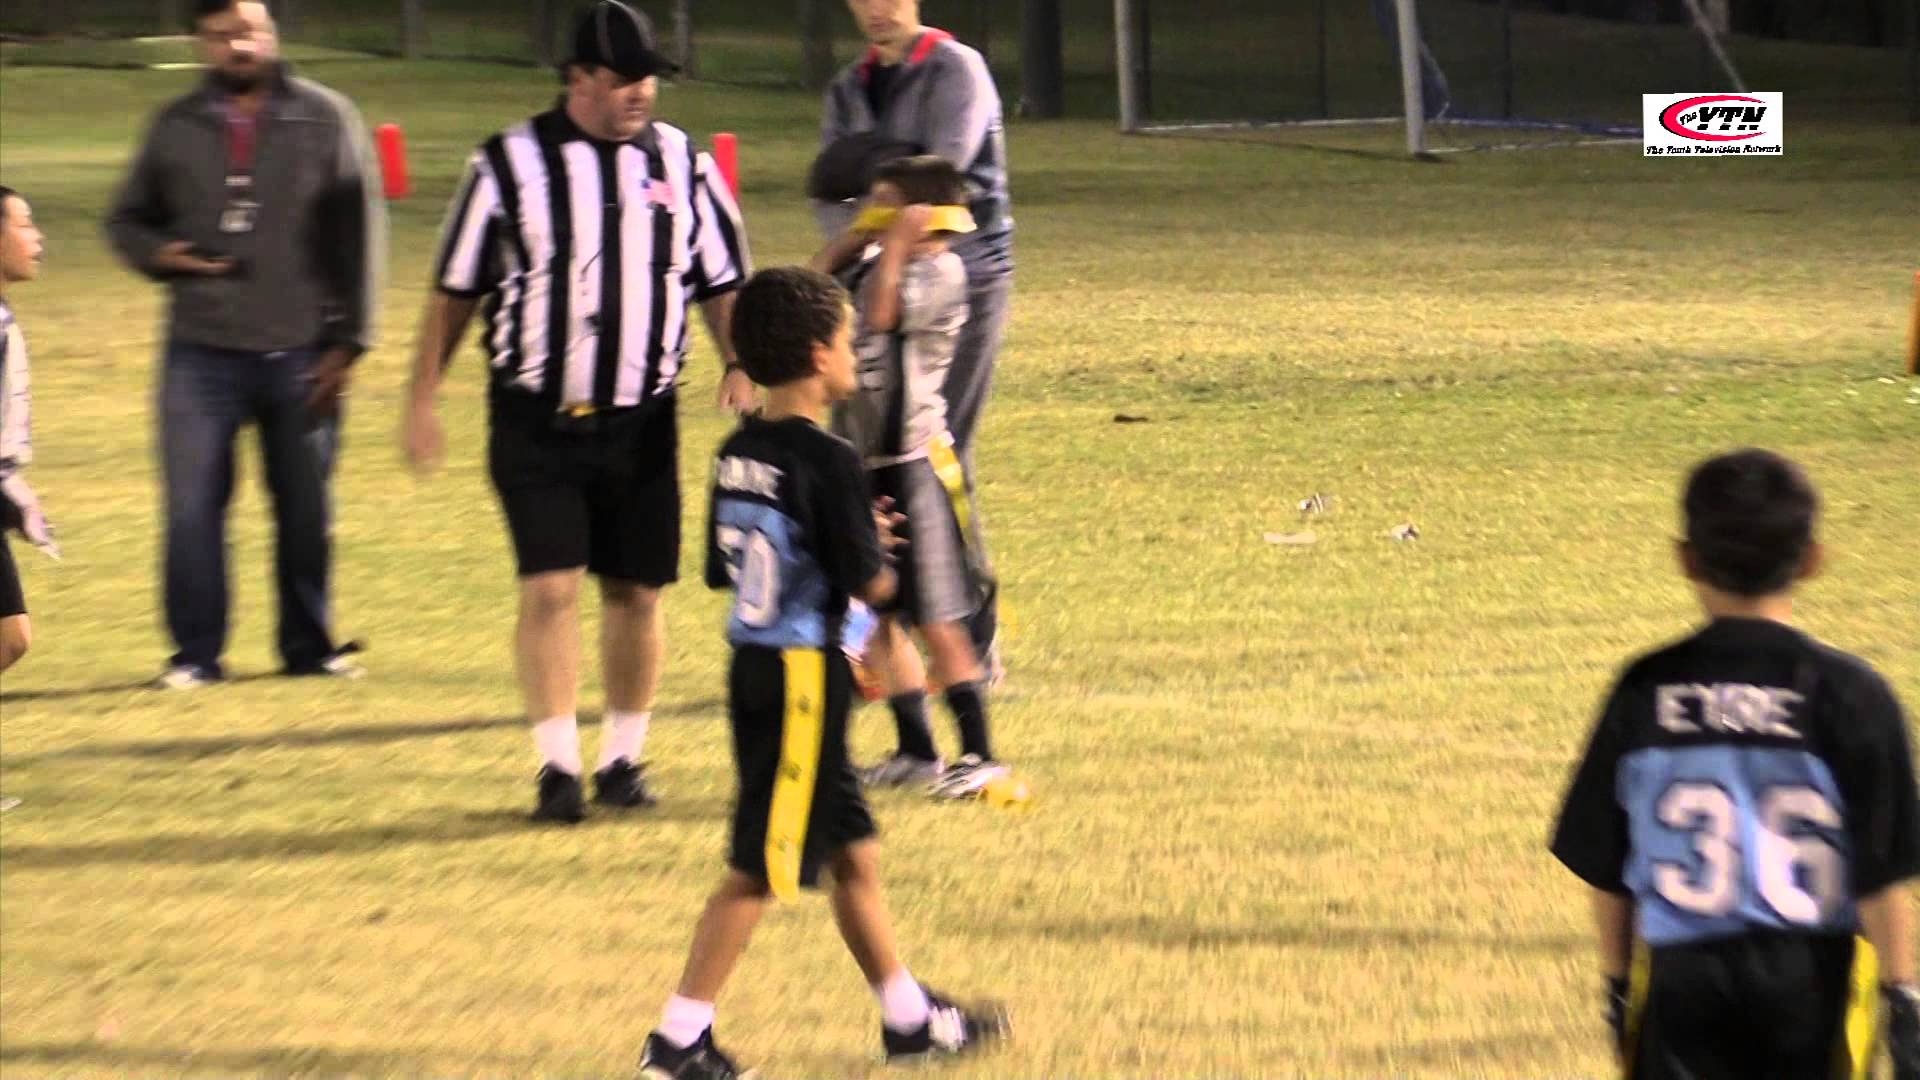 Raiders vs Panthers Championship Playoffs Round 2